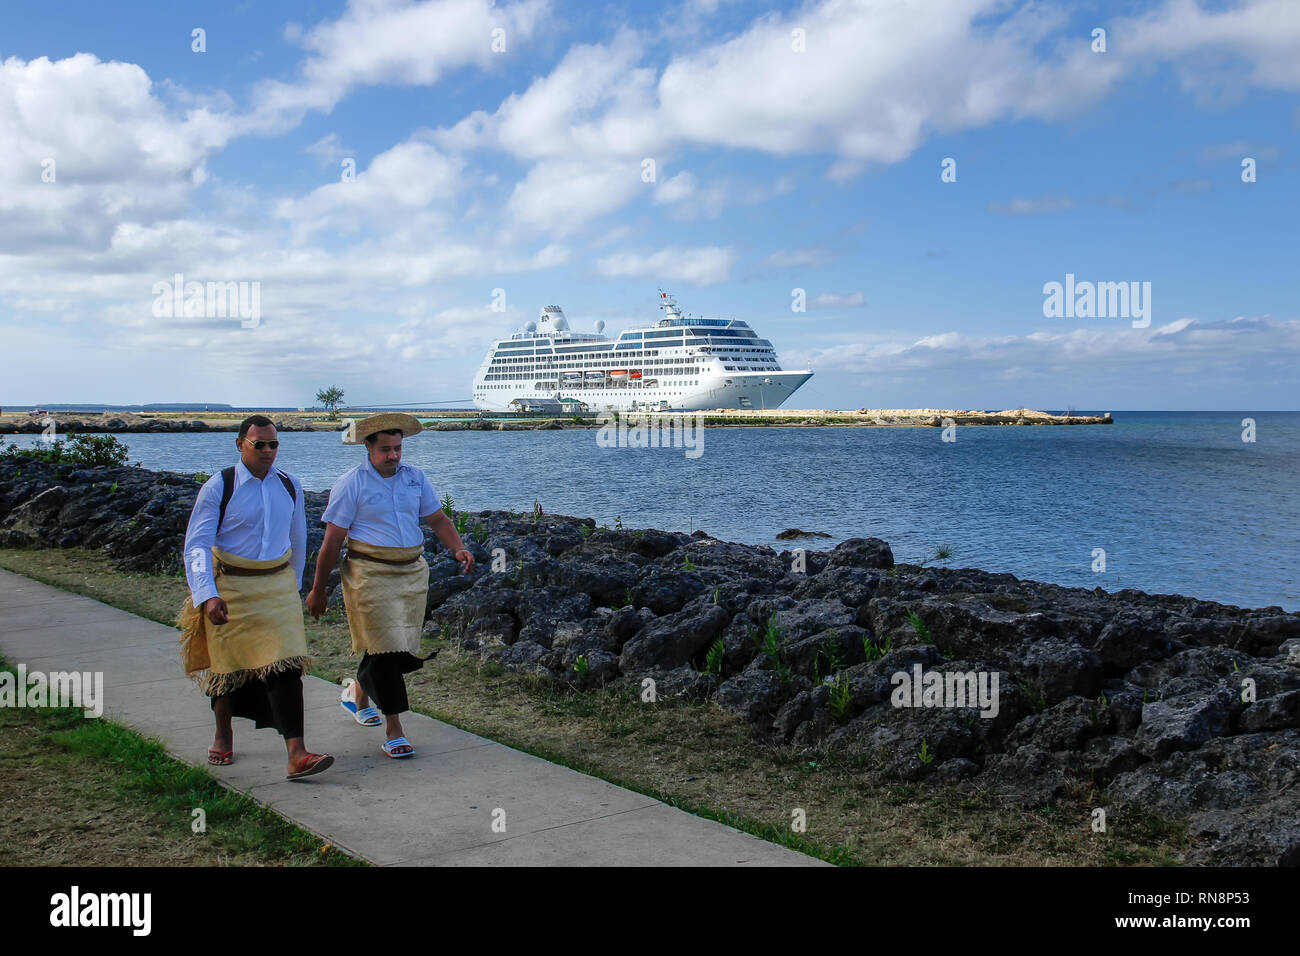 Local men walking at the waterfront in Nuku'alofa on Tongatapu island, Tonga. Nukuʻalofa is the capital of the Kingdom of Tonga Stock Photo